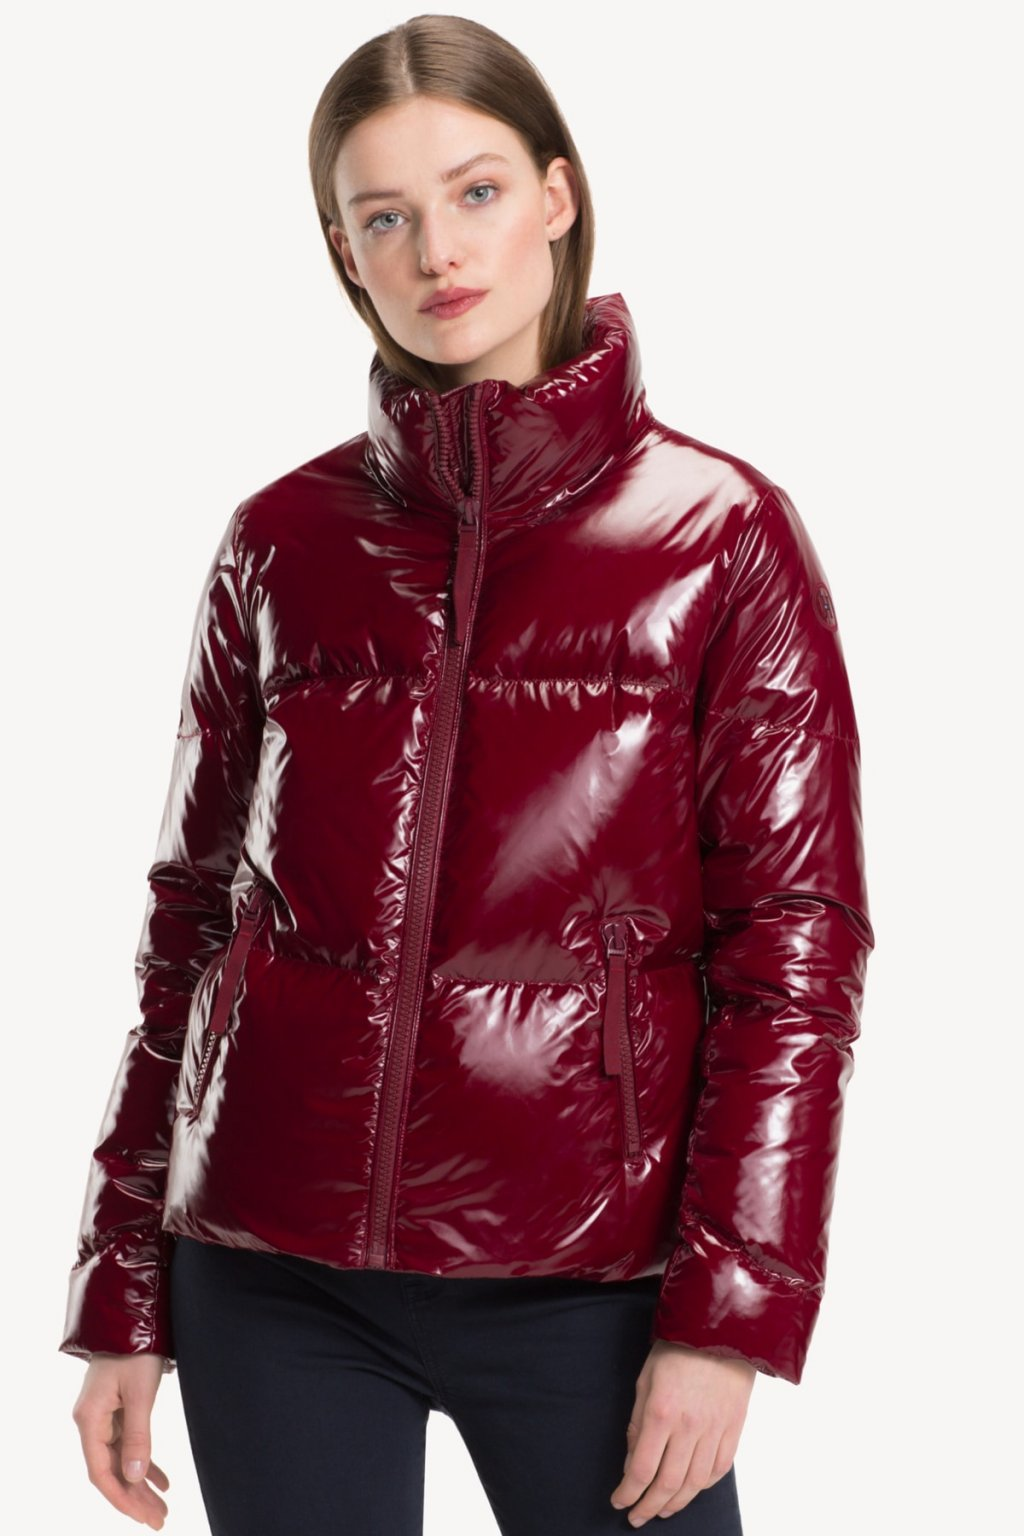 Hnědý dlouhý kabát Desigual - BERTOO - Outlet levně a073e558112